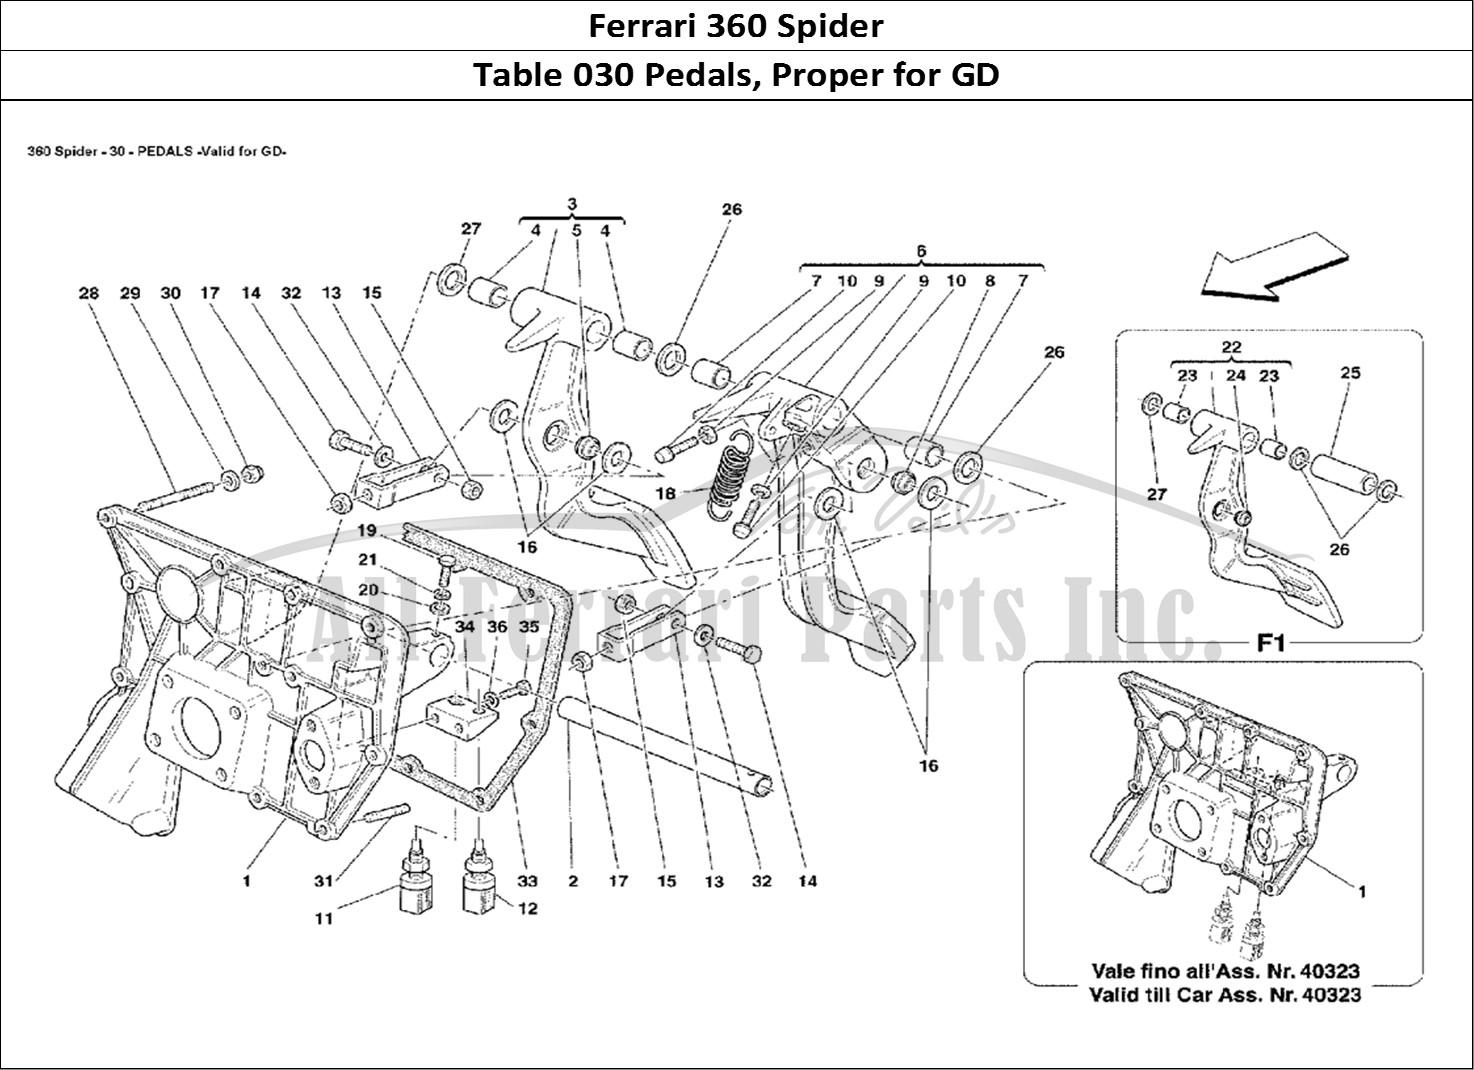 Buy Original Ferrari 360 Spider 030 Pedals Proper For Gd